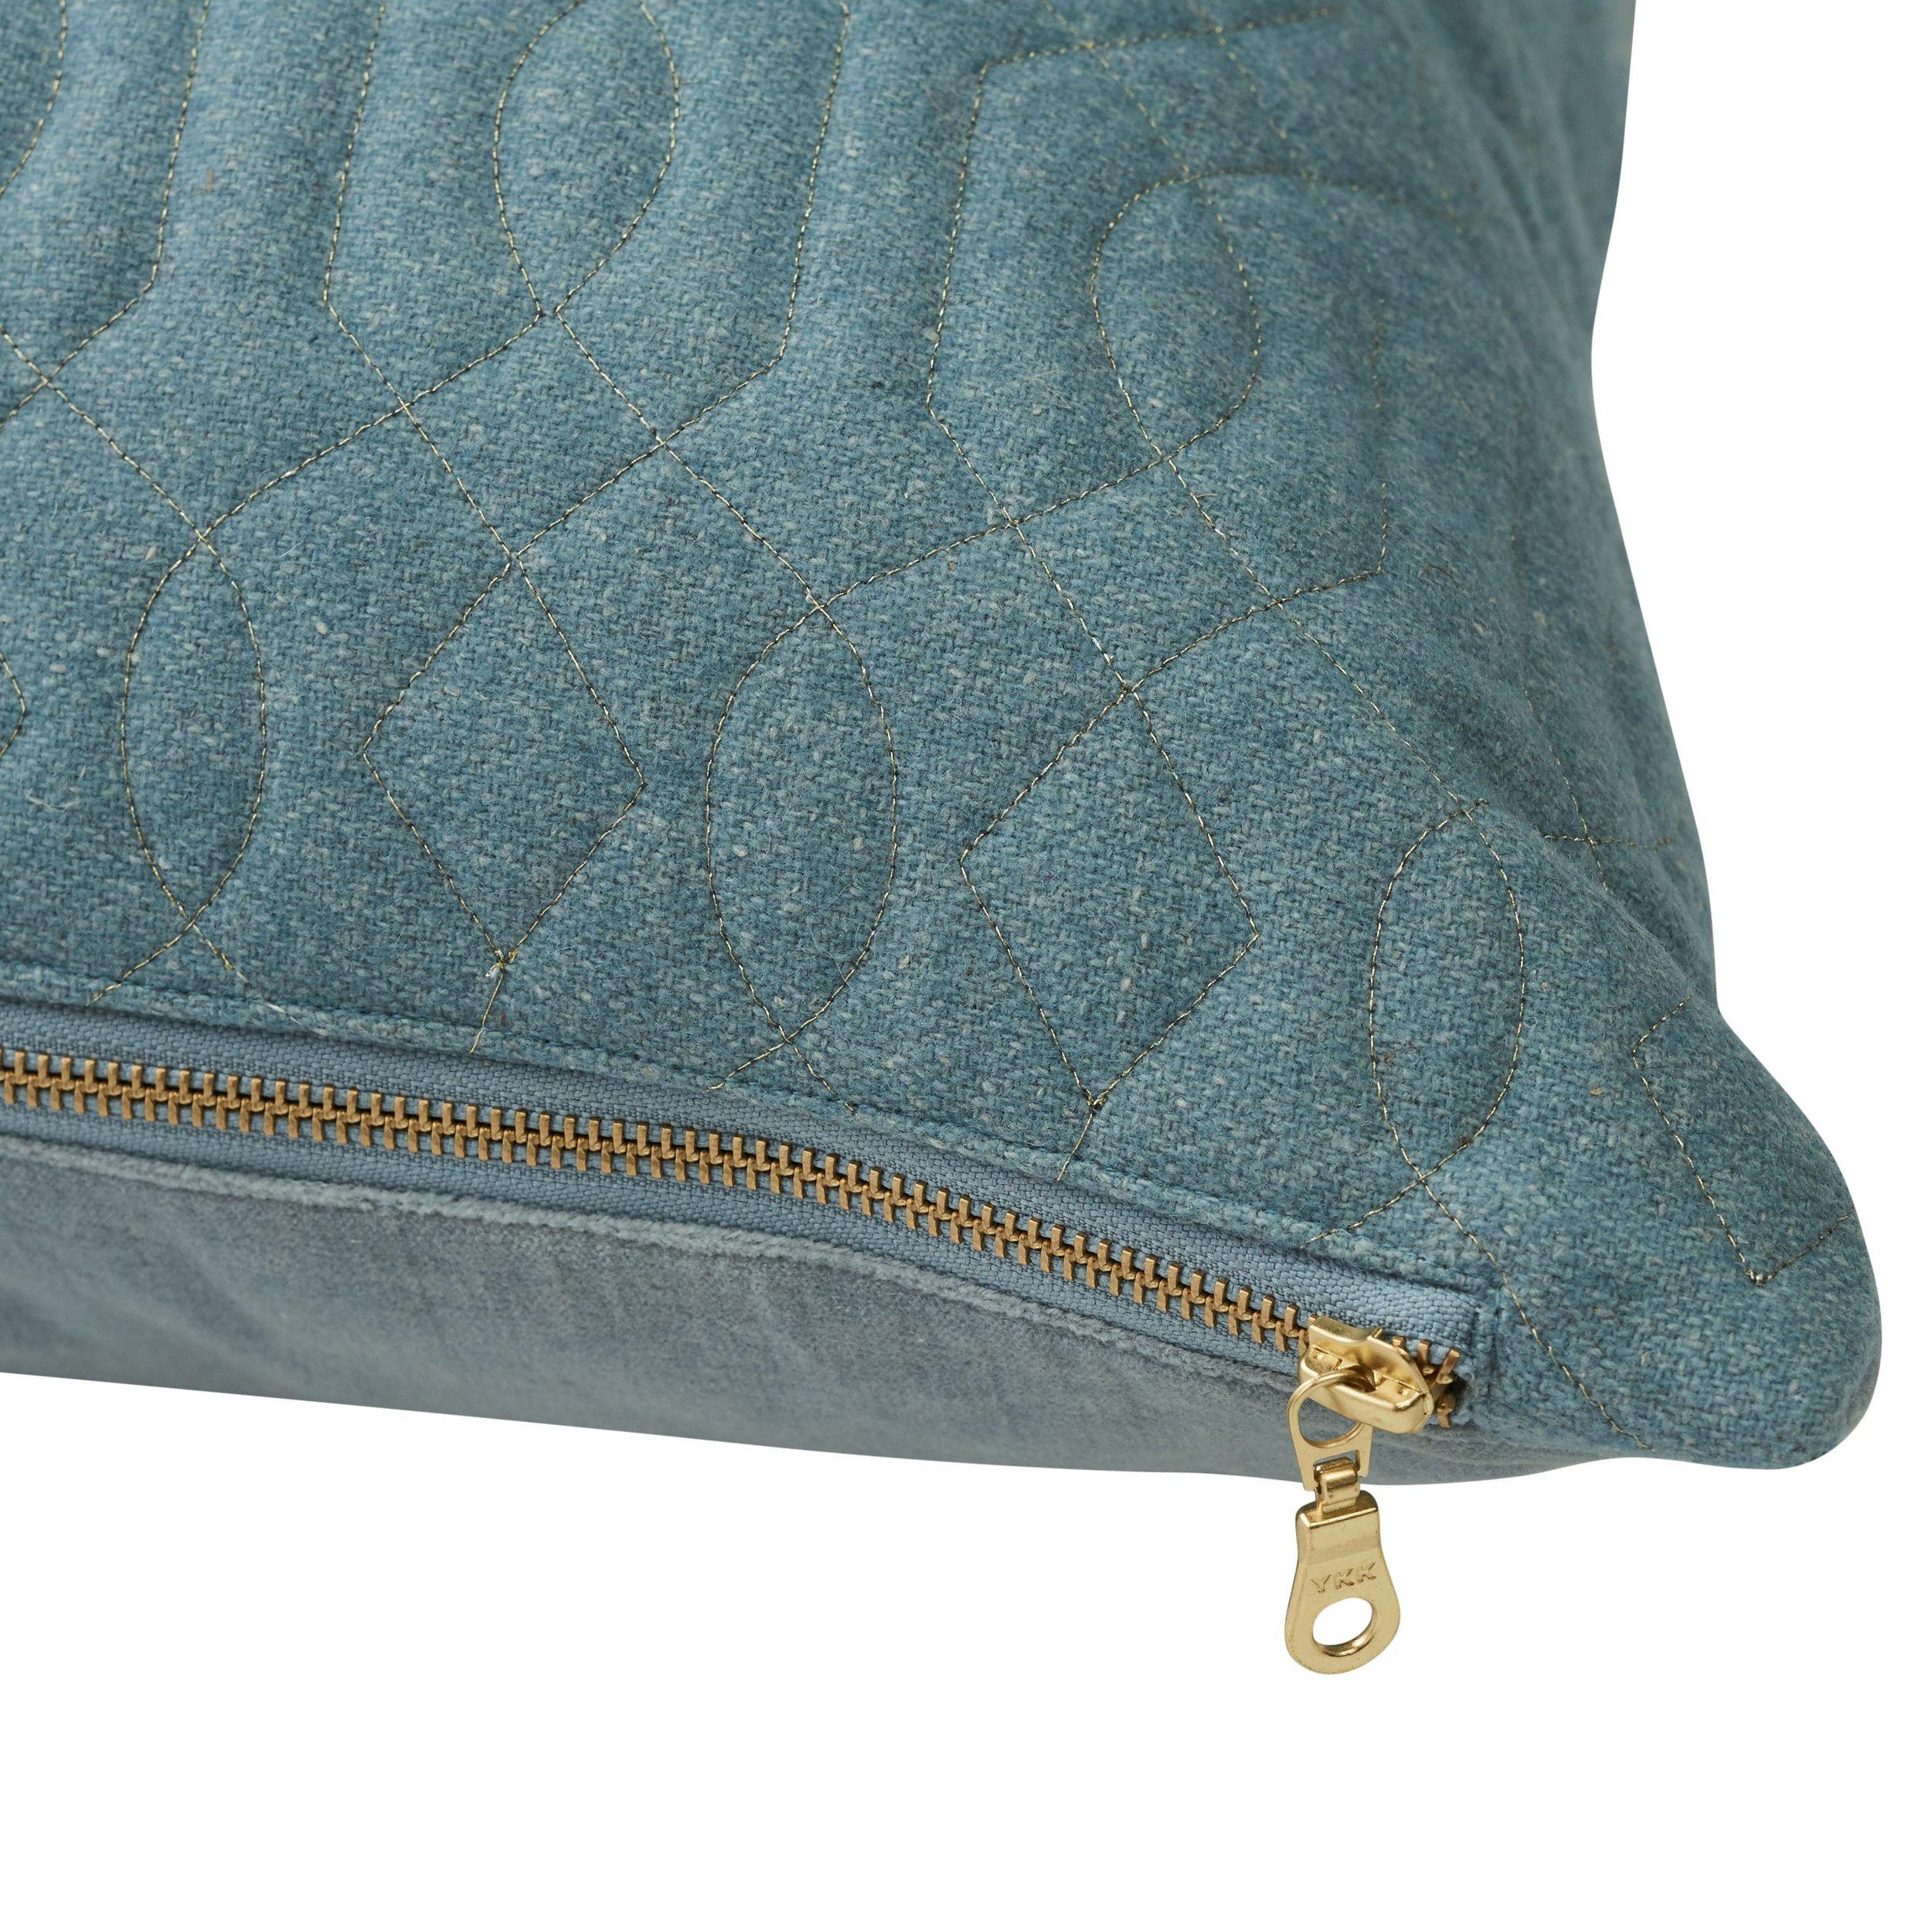 norfolk albert cushion -